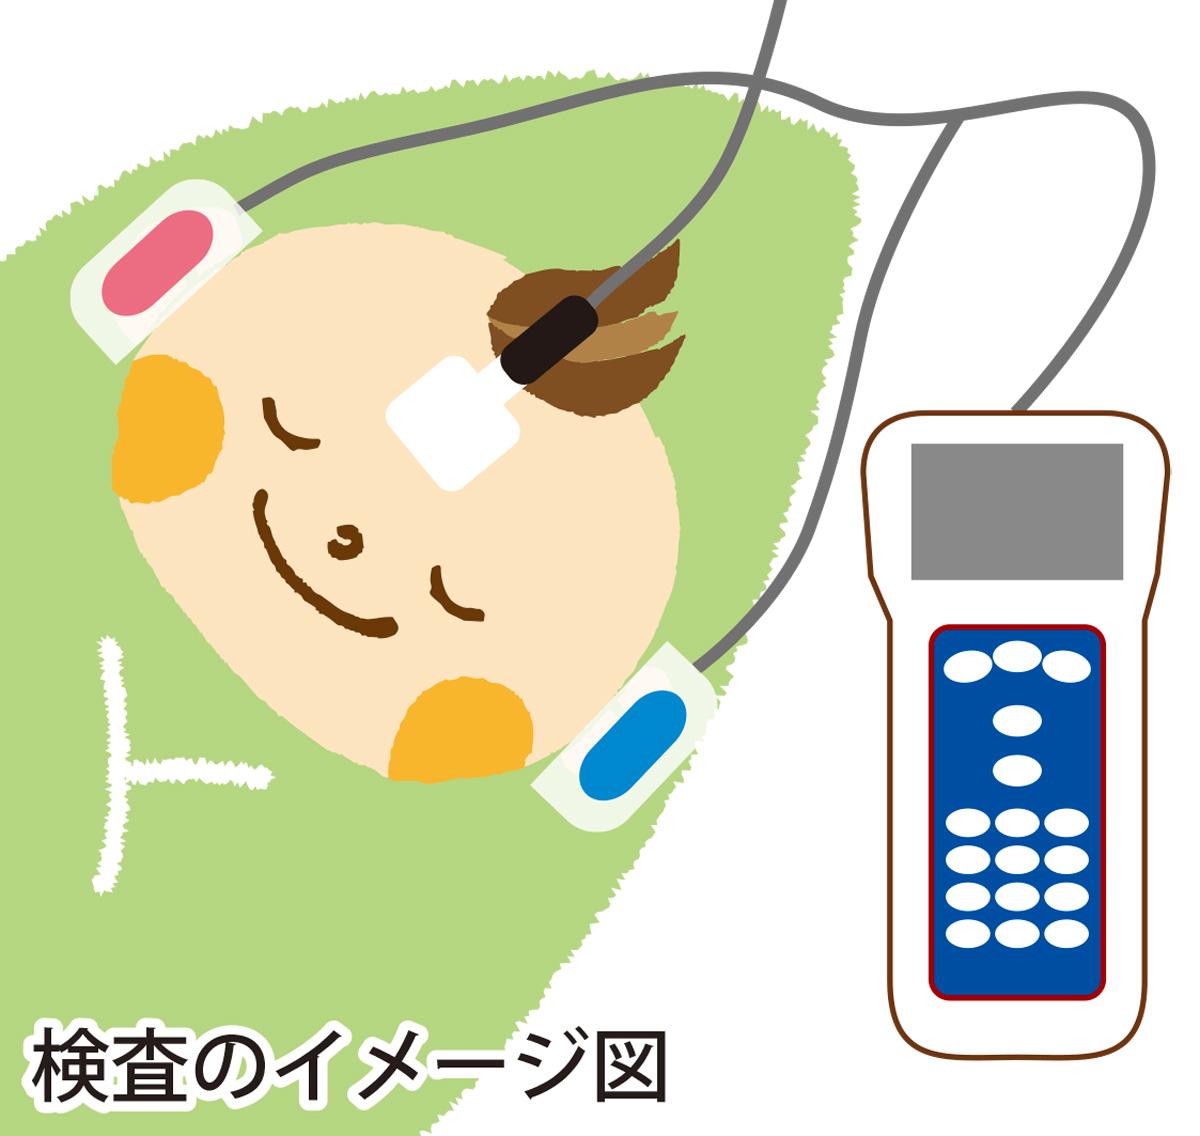 新生児聴覚検査に助成